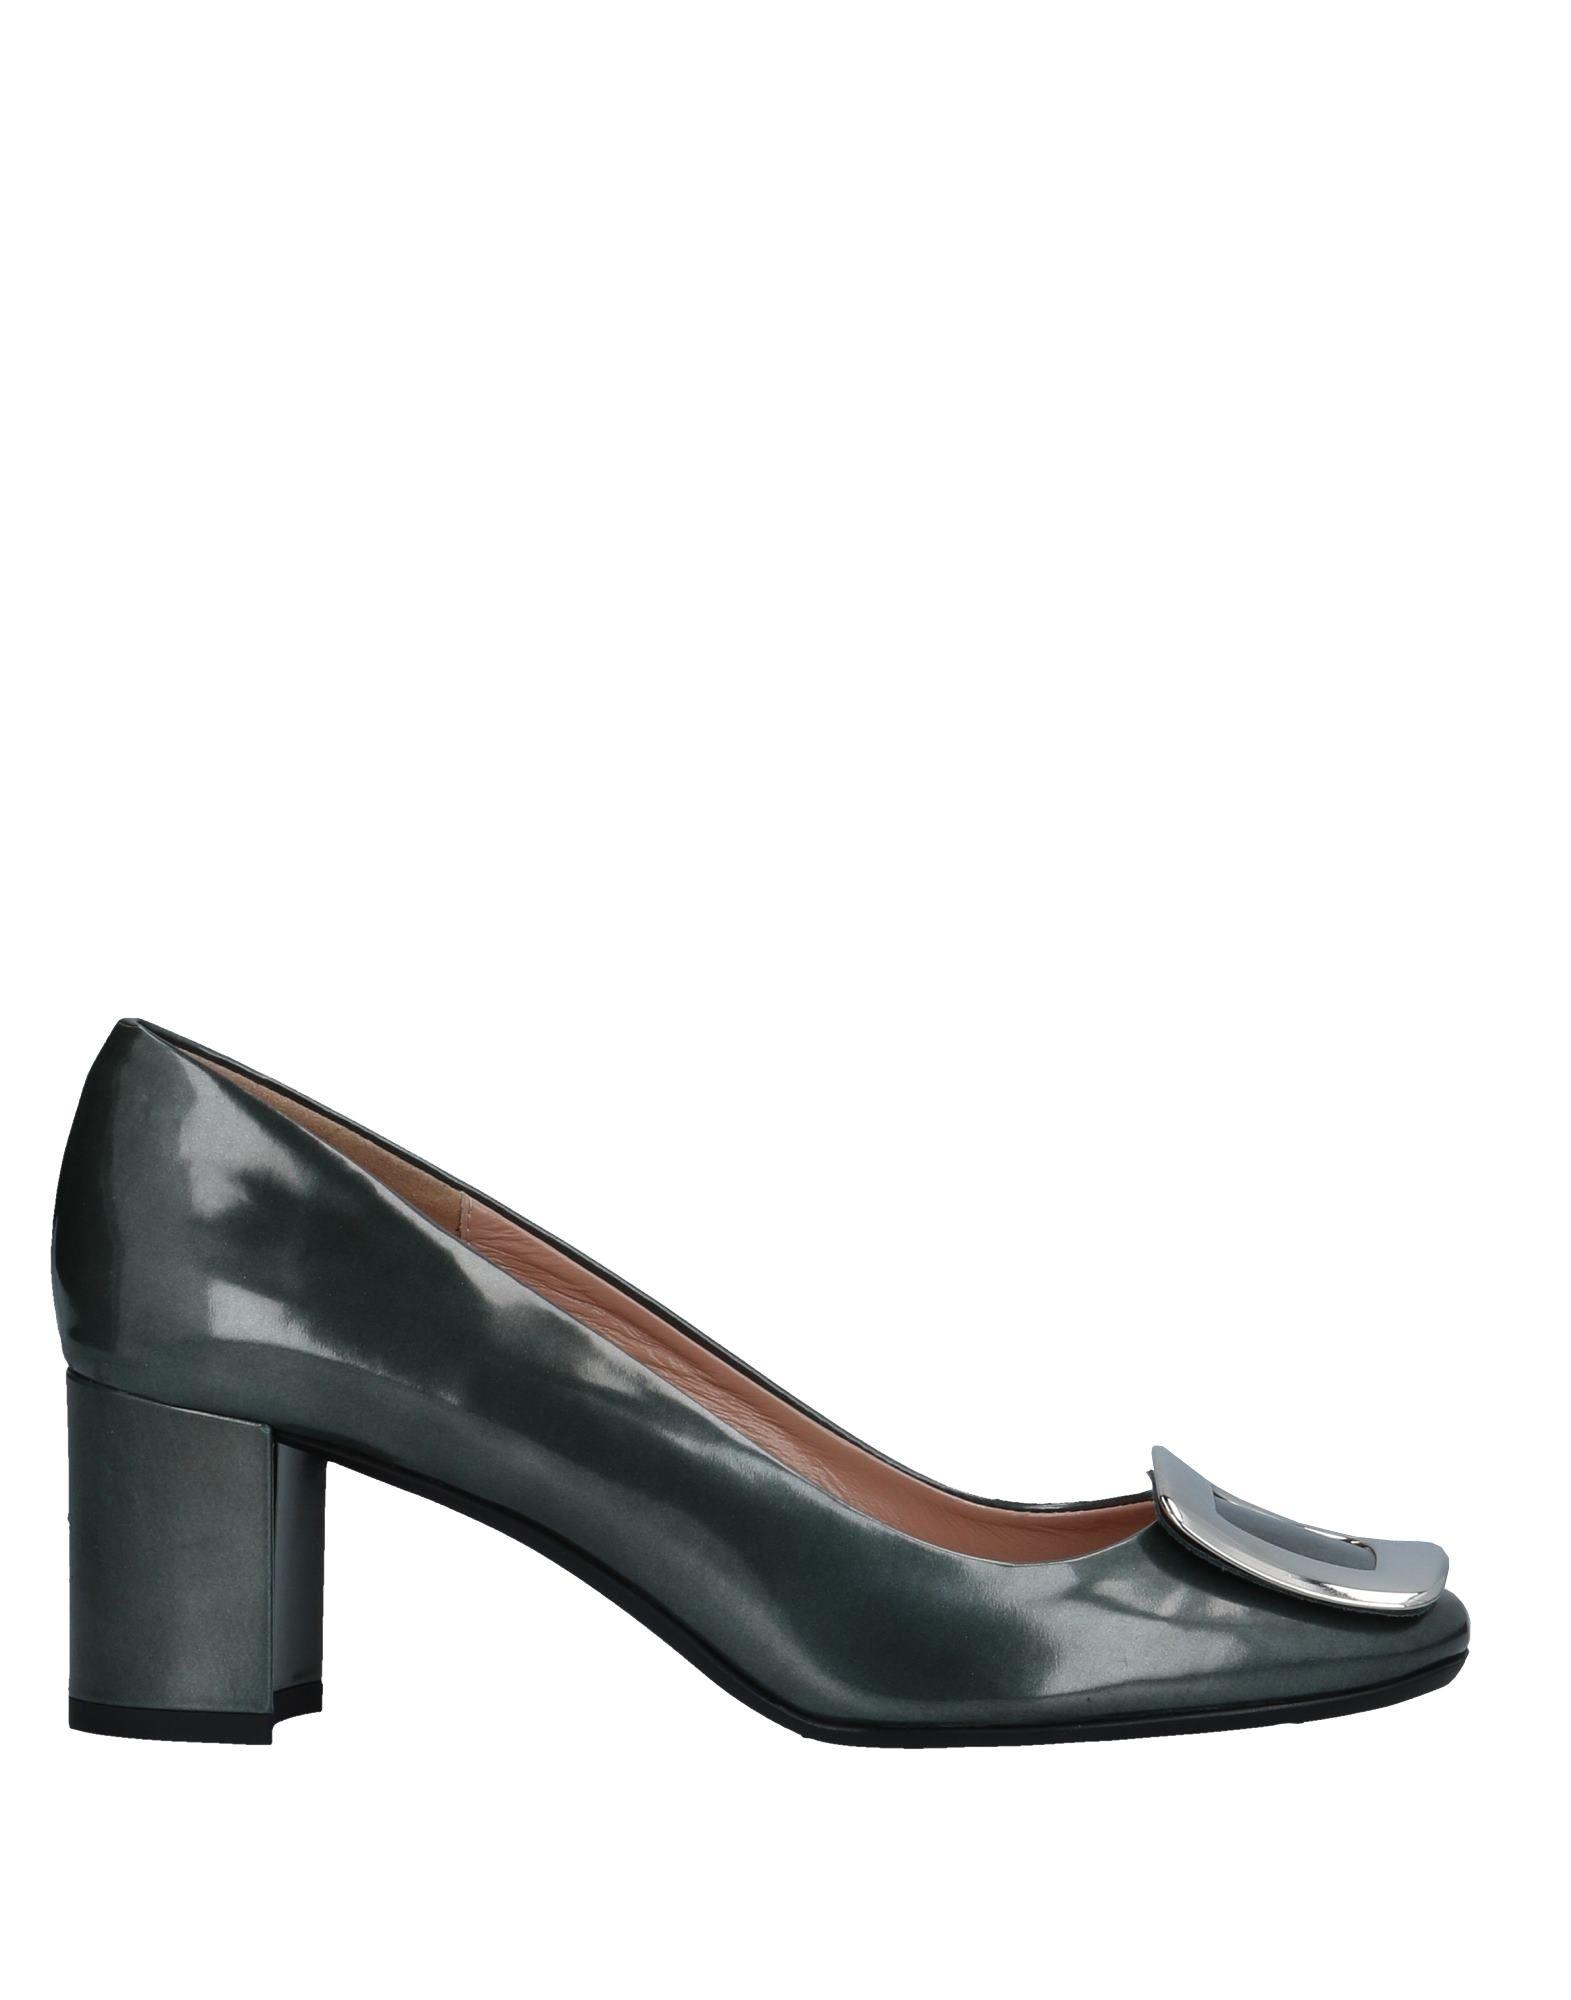 Andrea Morando Pumps Damen  11525270QL Gute Qualität beliebte Schuhe